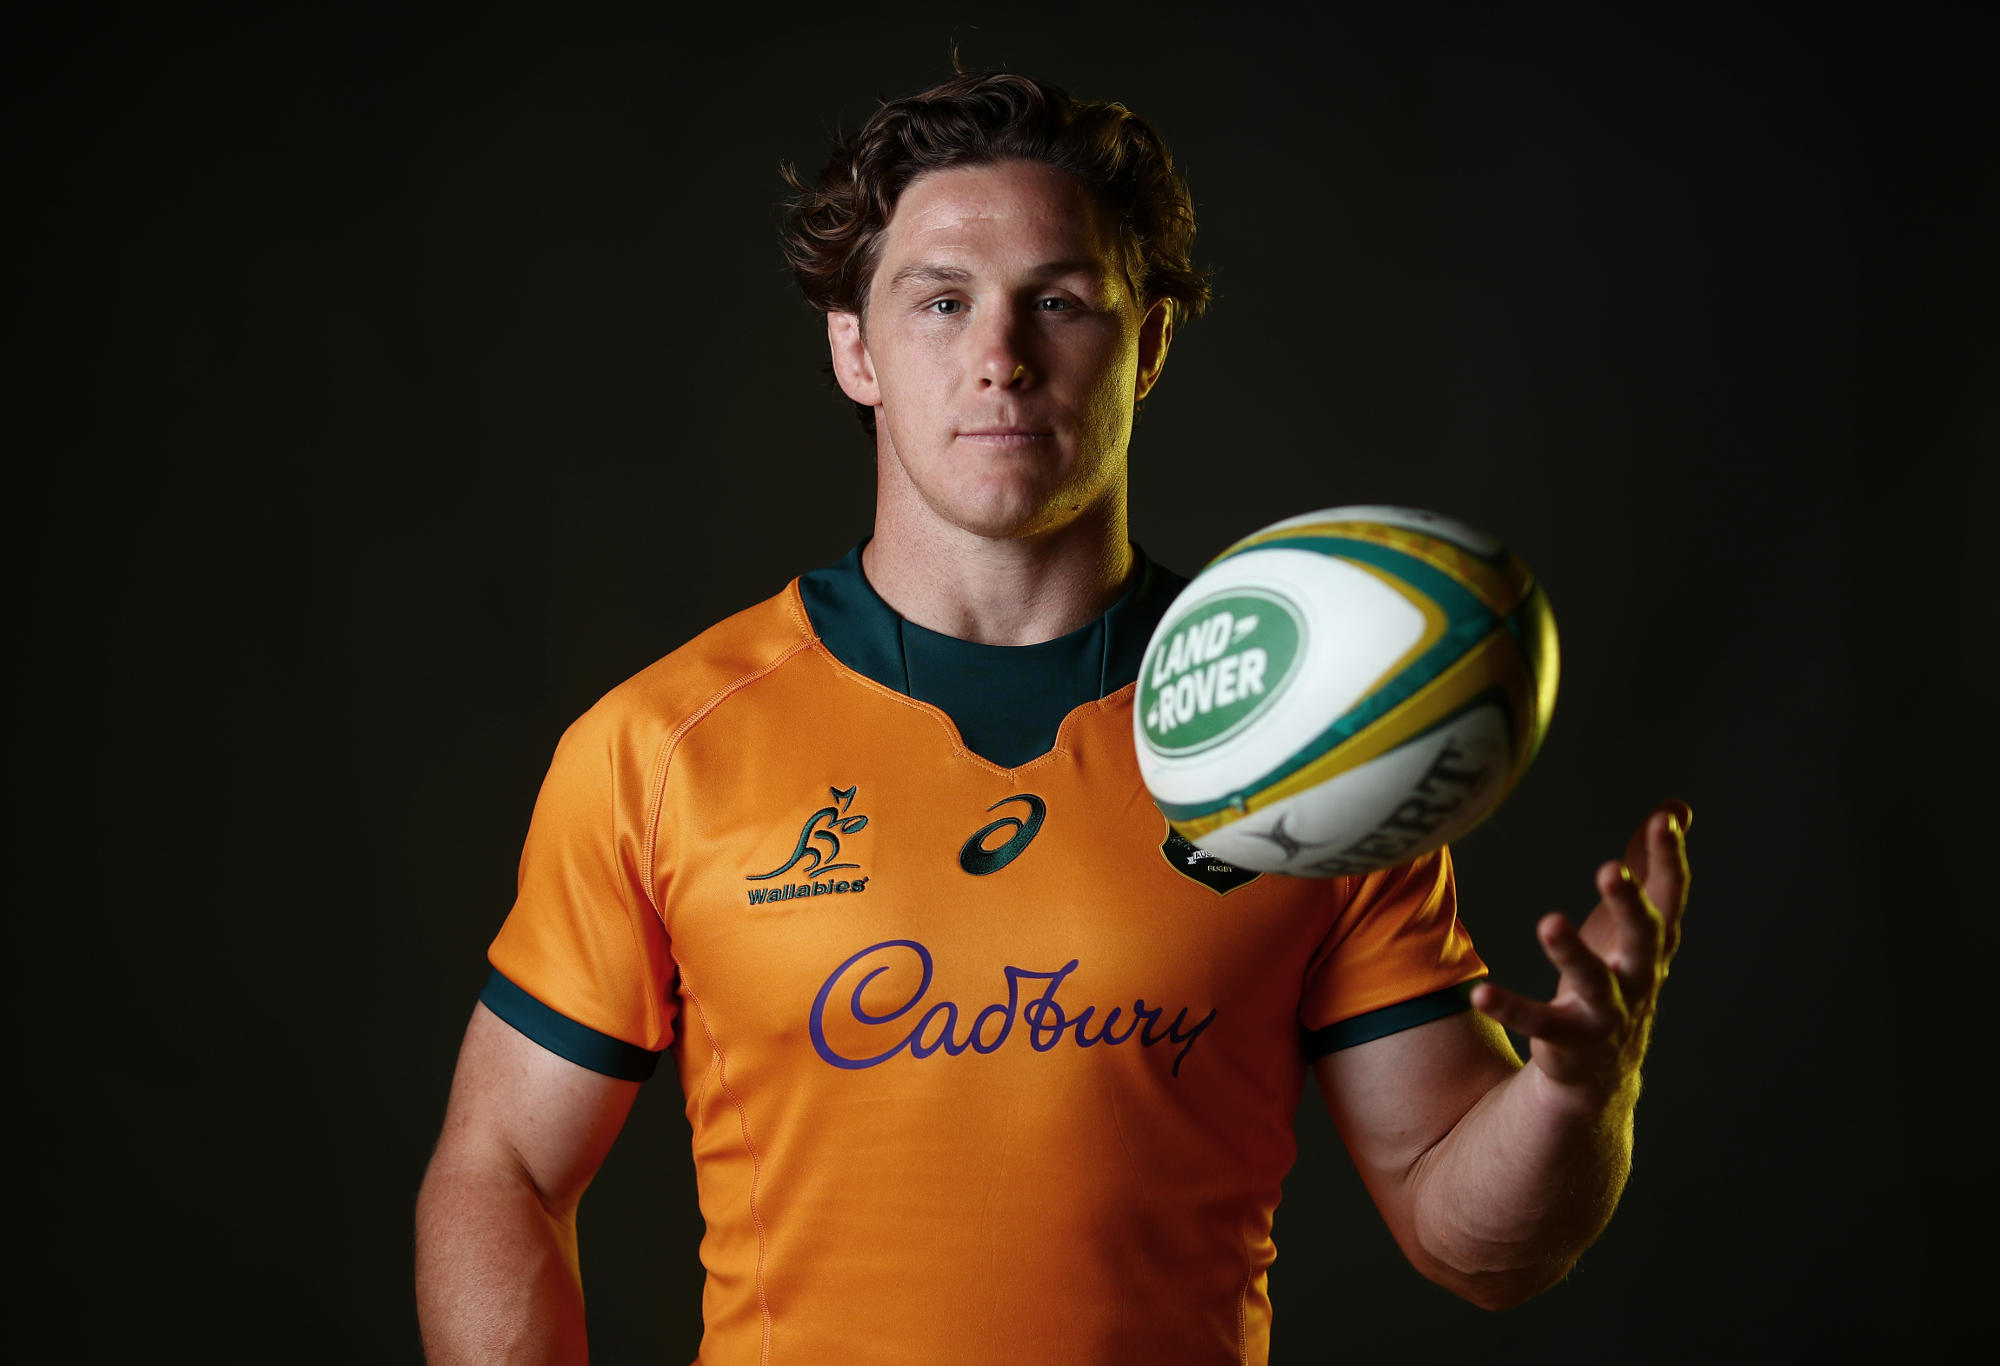 Michael Hooper poses during the Australian Wallabies player portrait